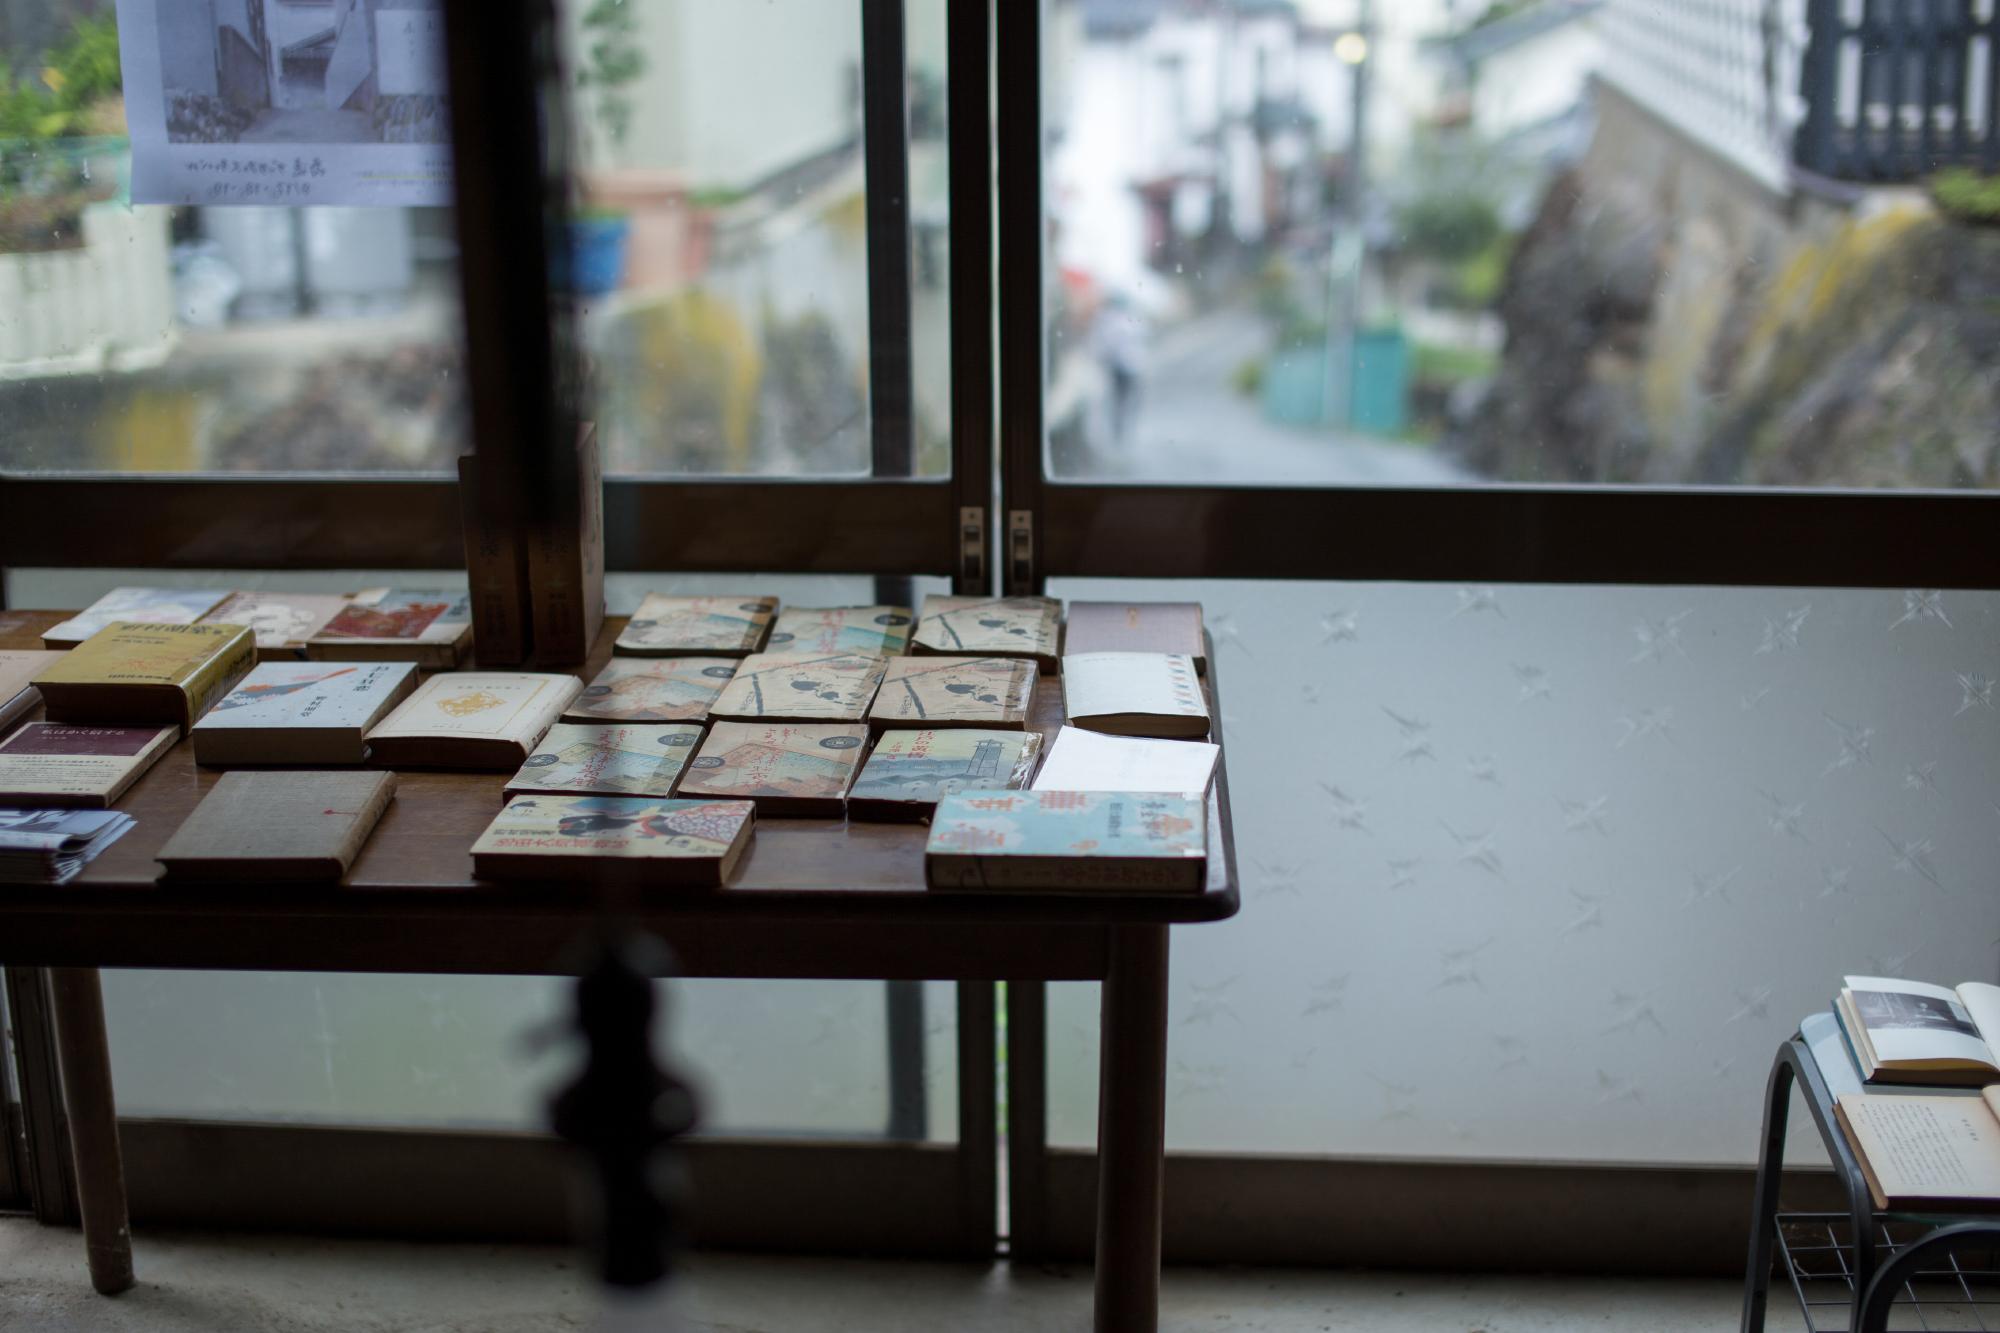 oneday at 高遠ブックフェスティバル